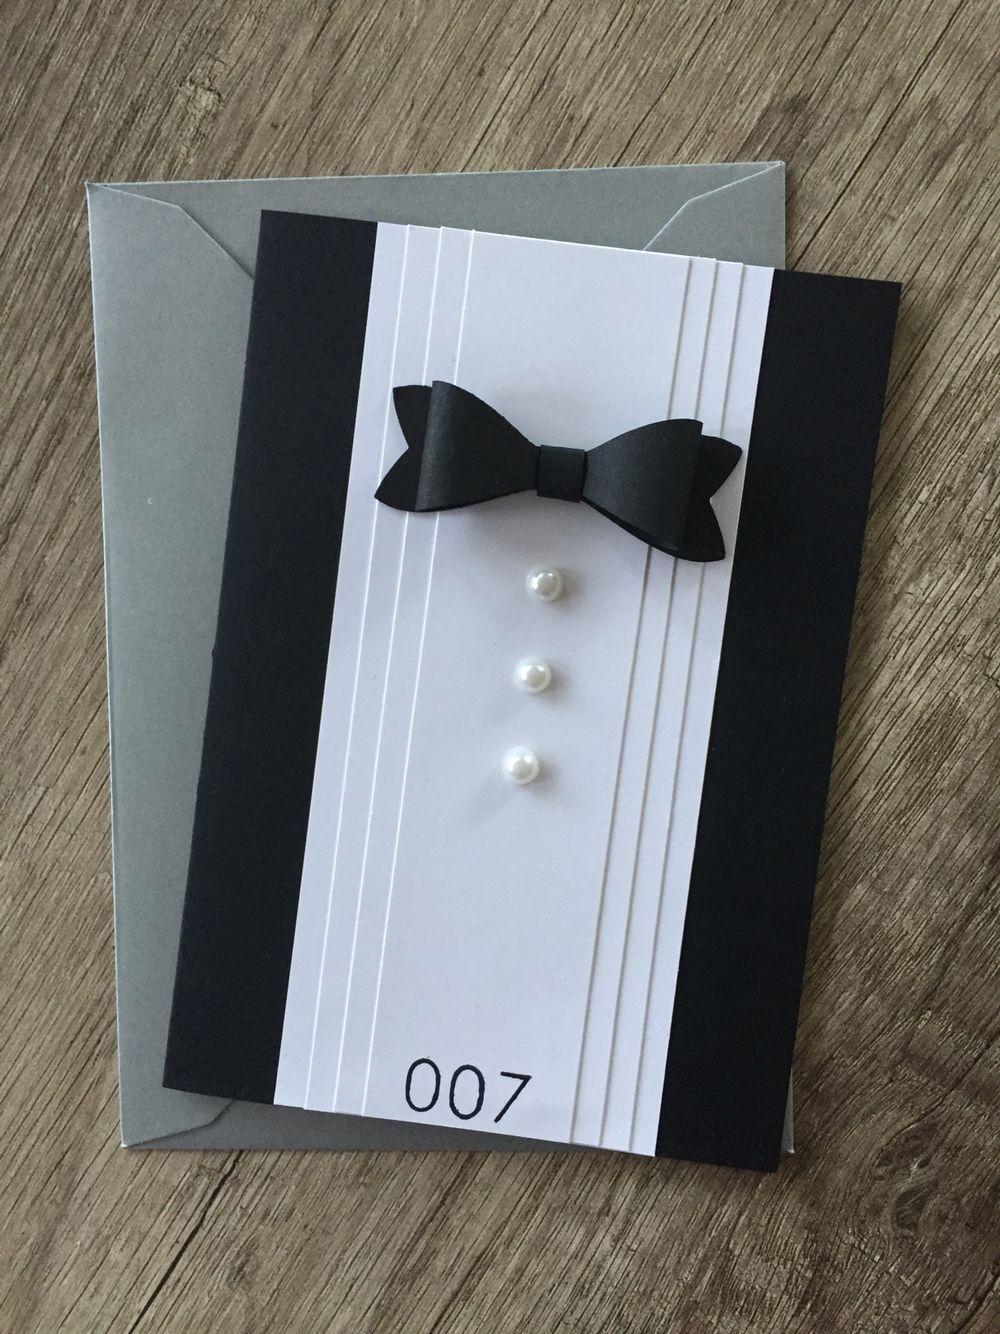 James Bond Geburtstag